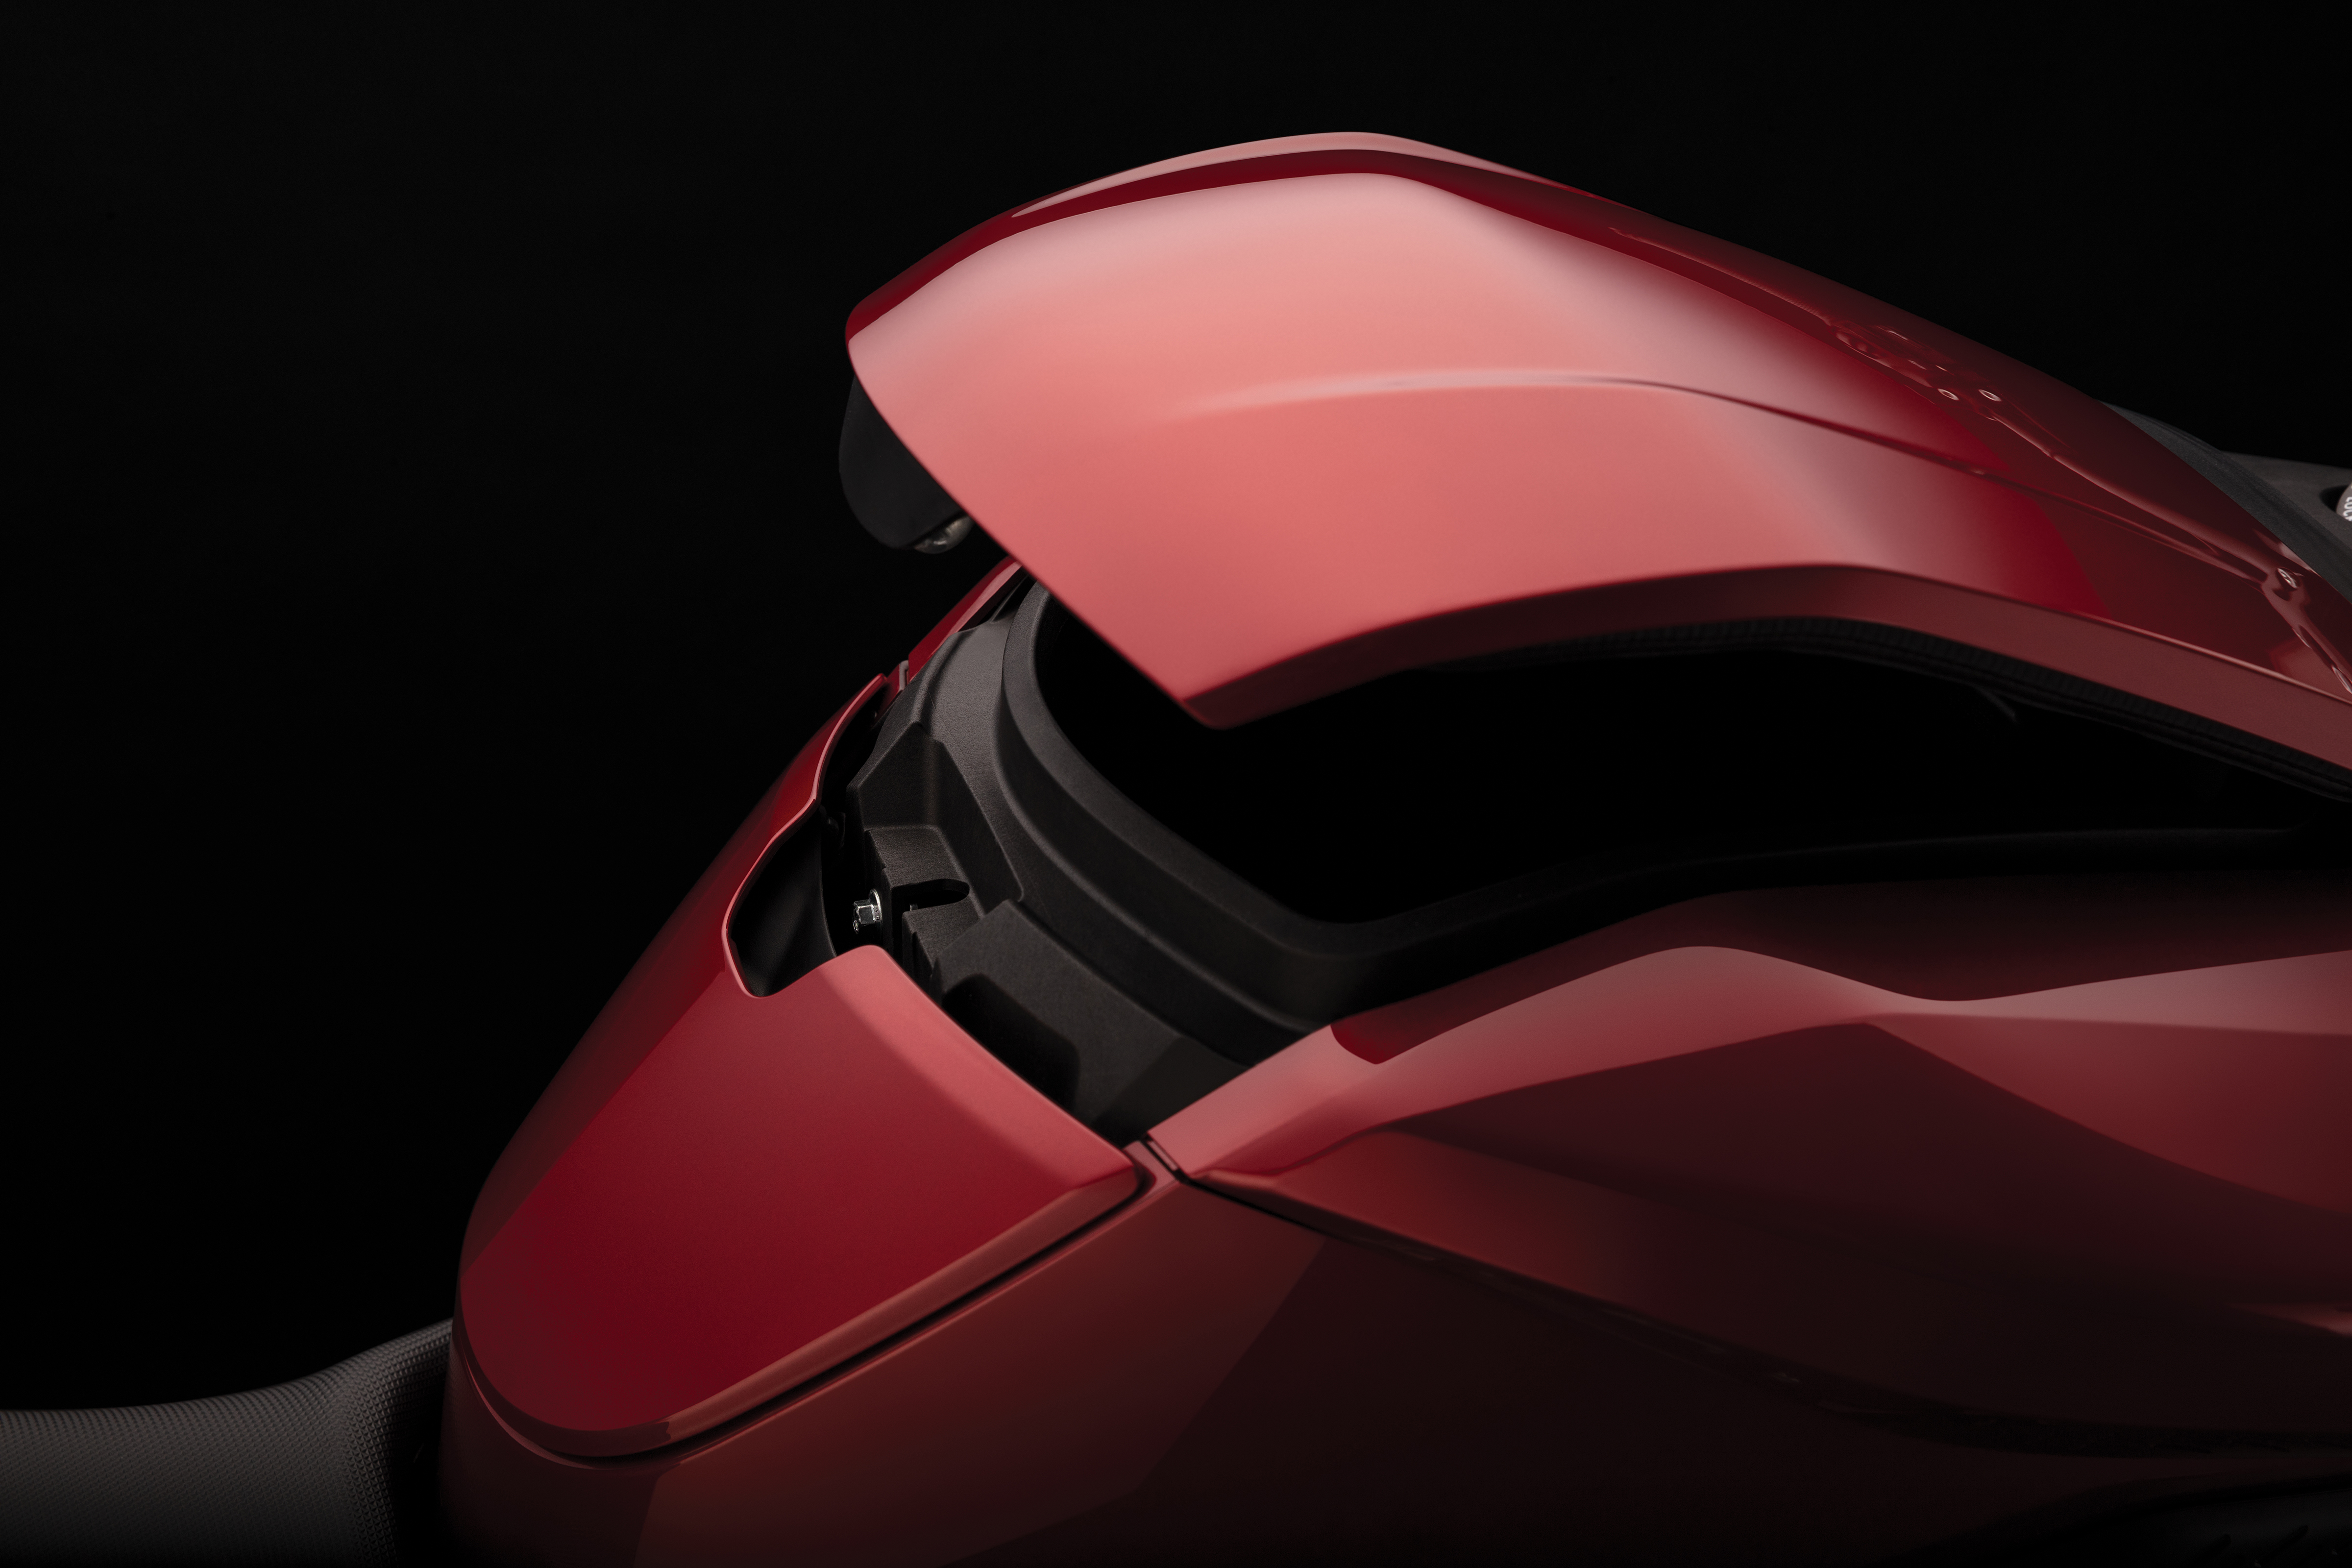 2020 Zero SR/F Electric Motorcycle: Storage